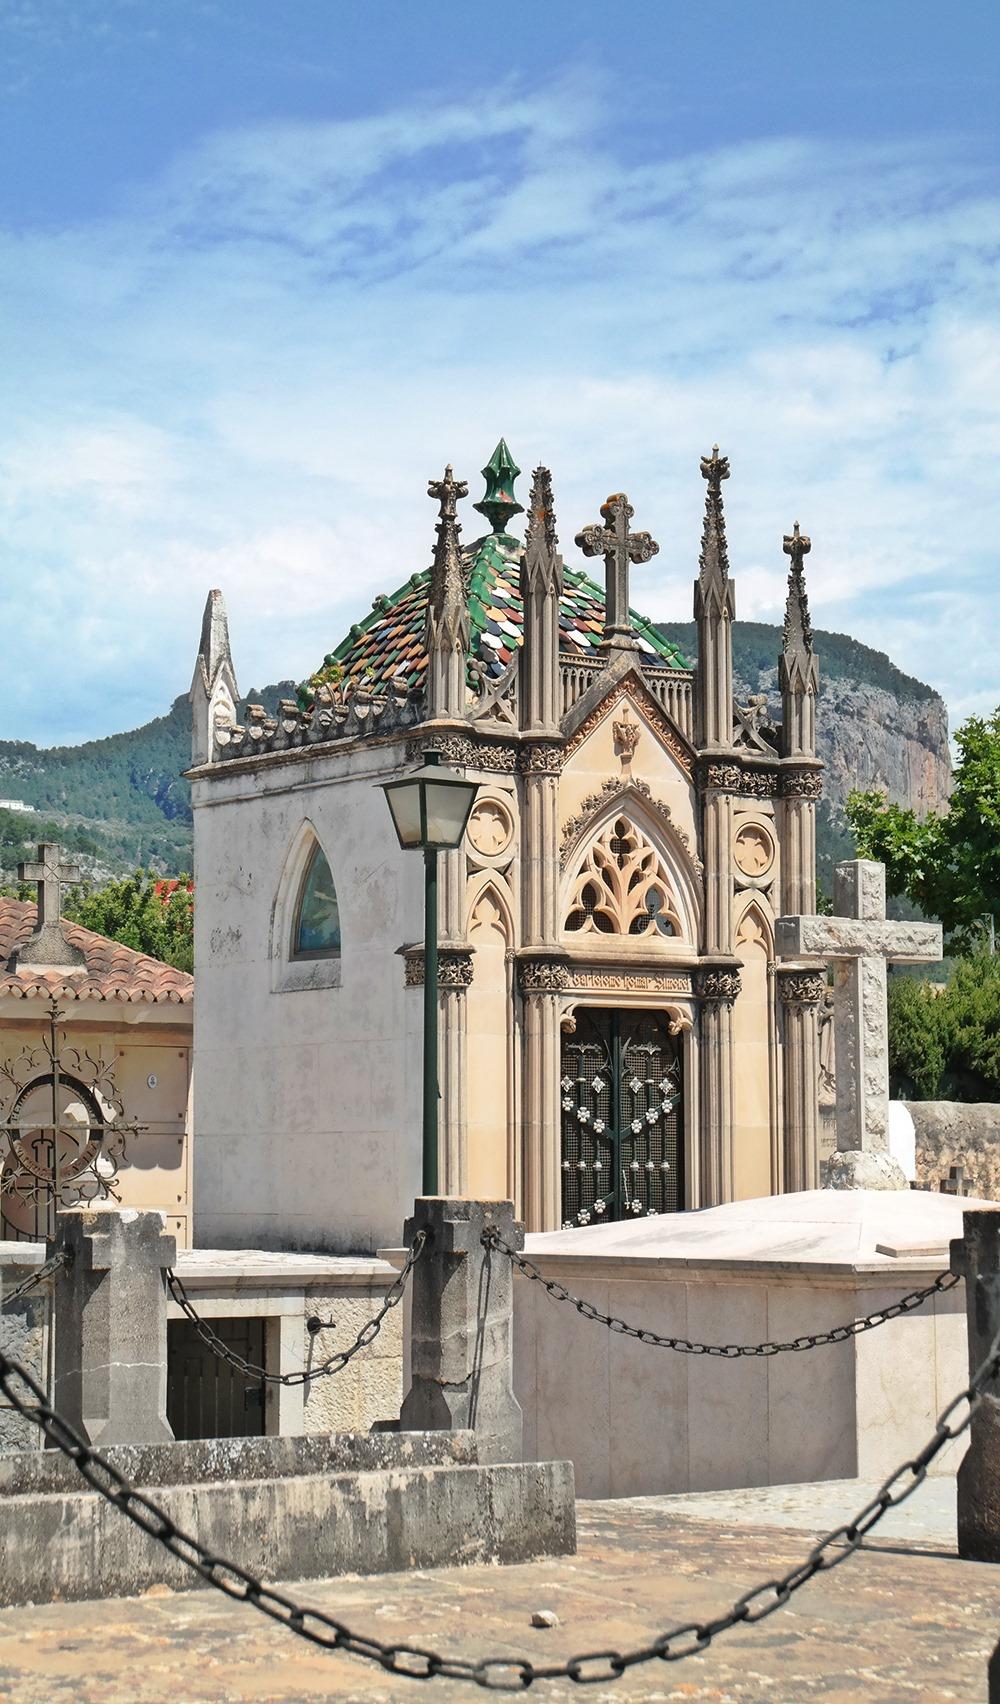 Mallorca-Alaro-Friedhof-Gruft-Buntes-Dach-2